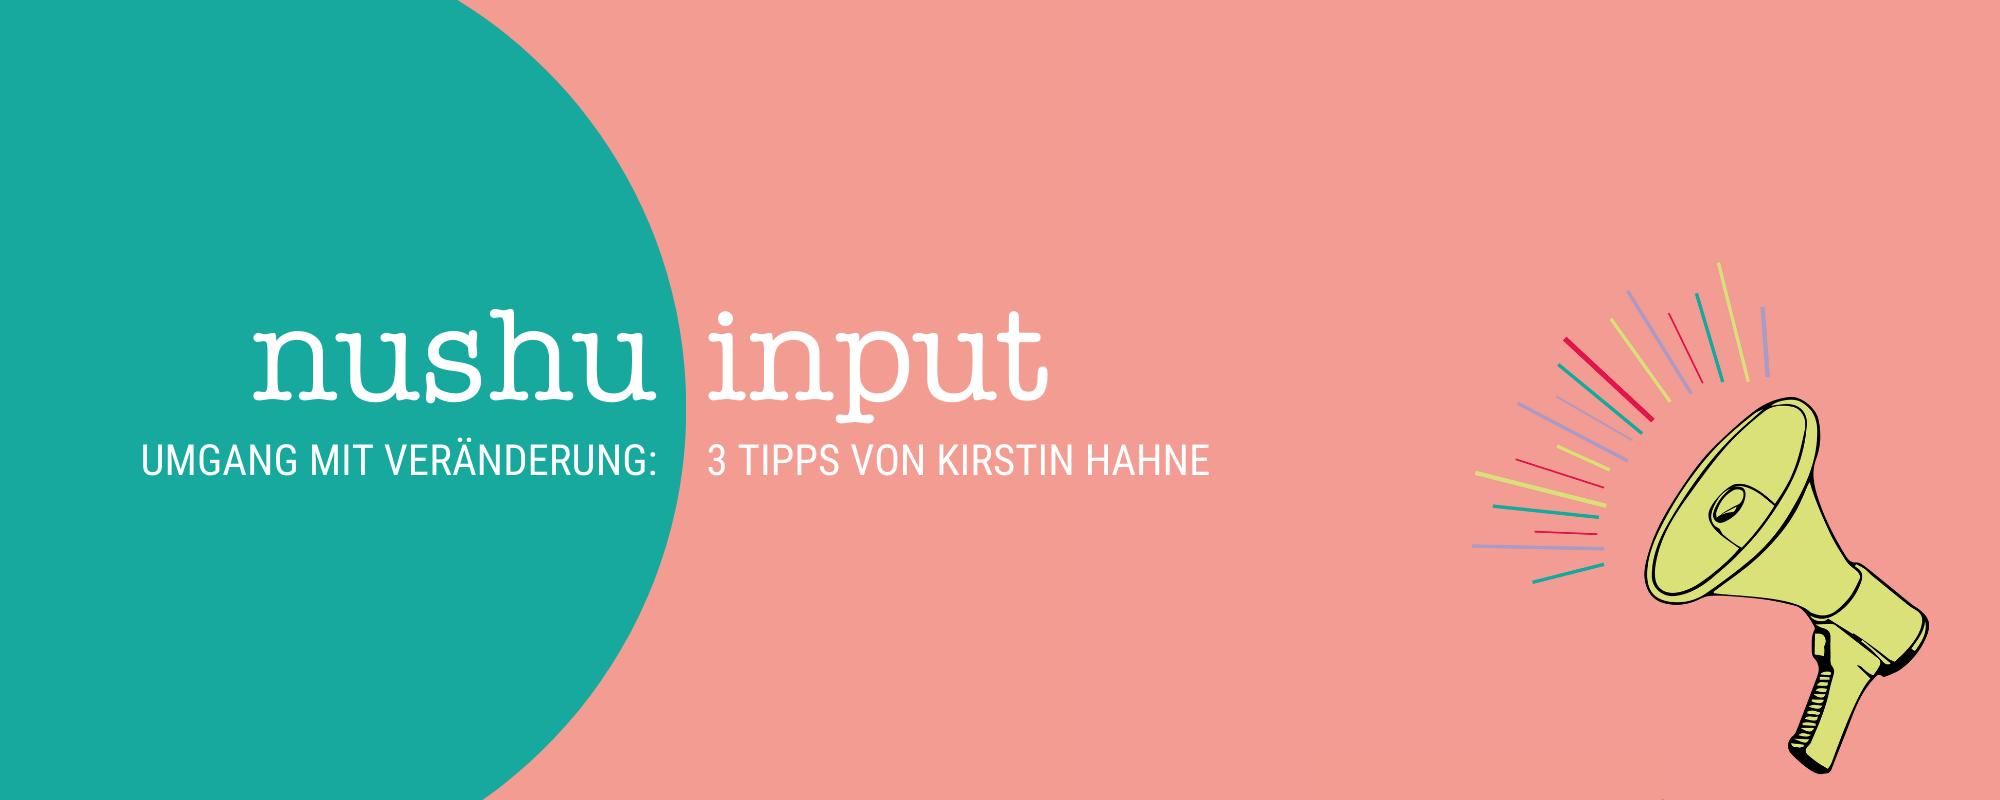 nushu input Umgang mit Veränderung